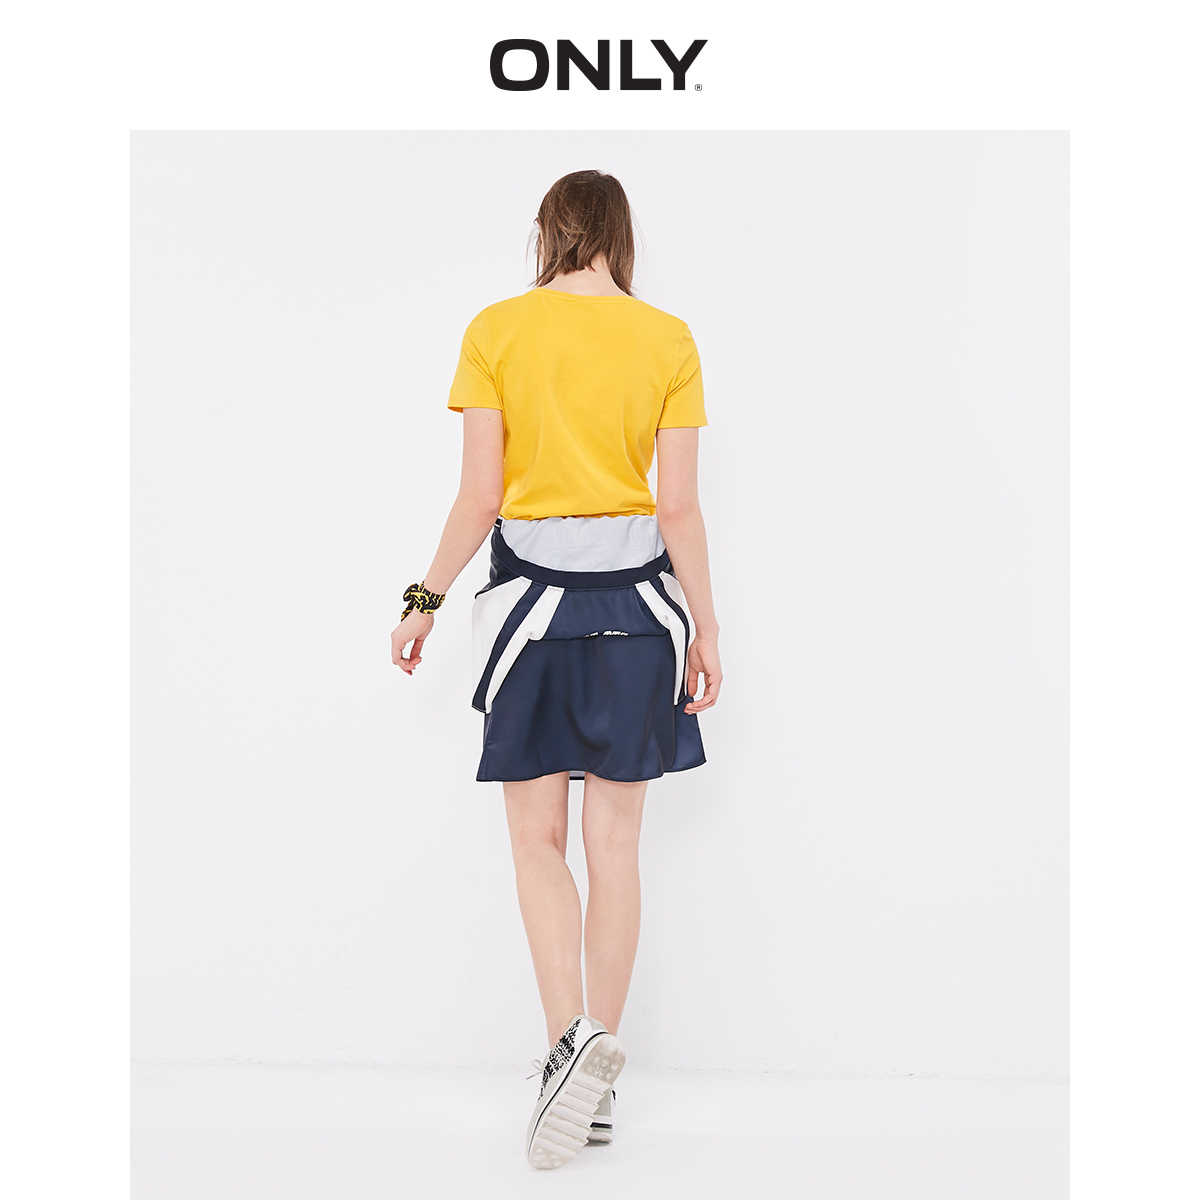 Camiseta de manga corta de Color puro Slim Fit ONLY para Mujer | 119201634